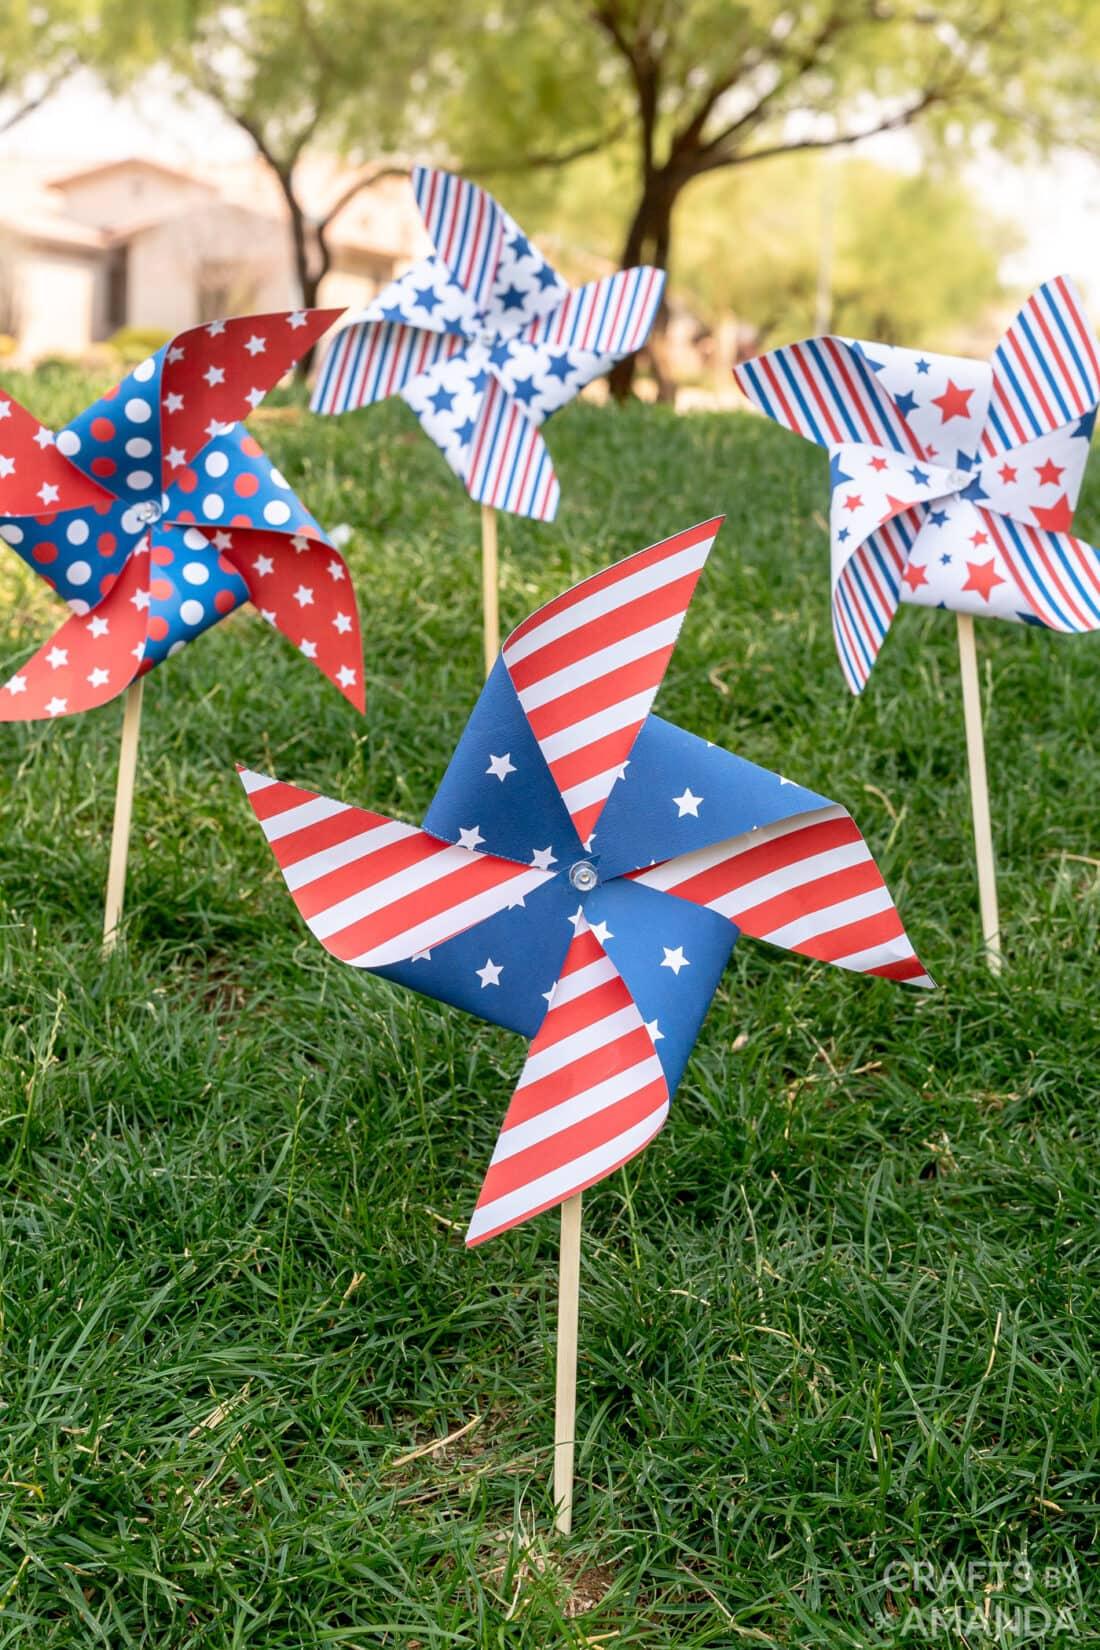 patriotic pinwheels in the grass